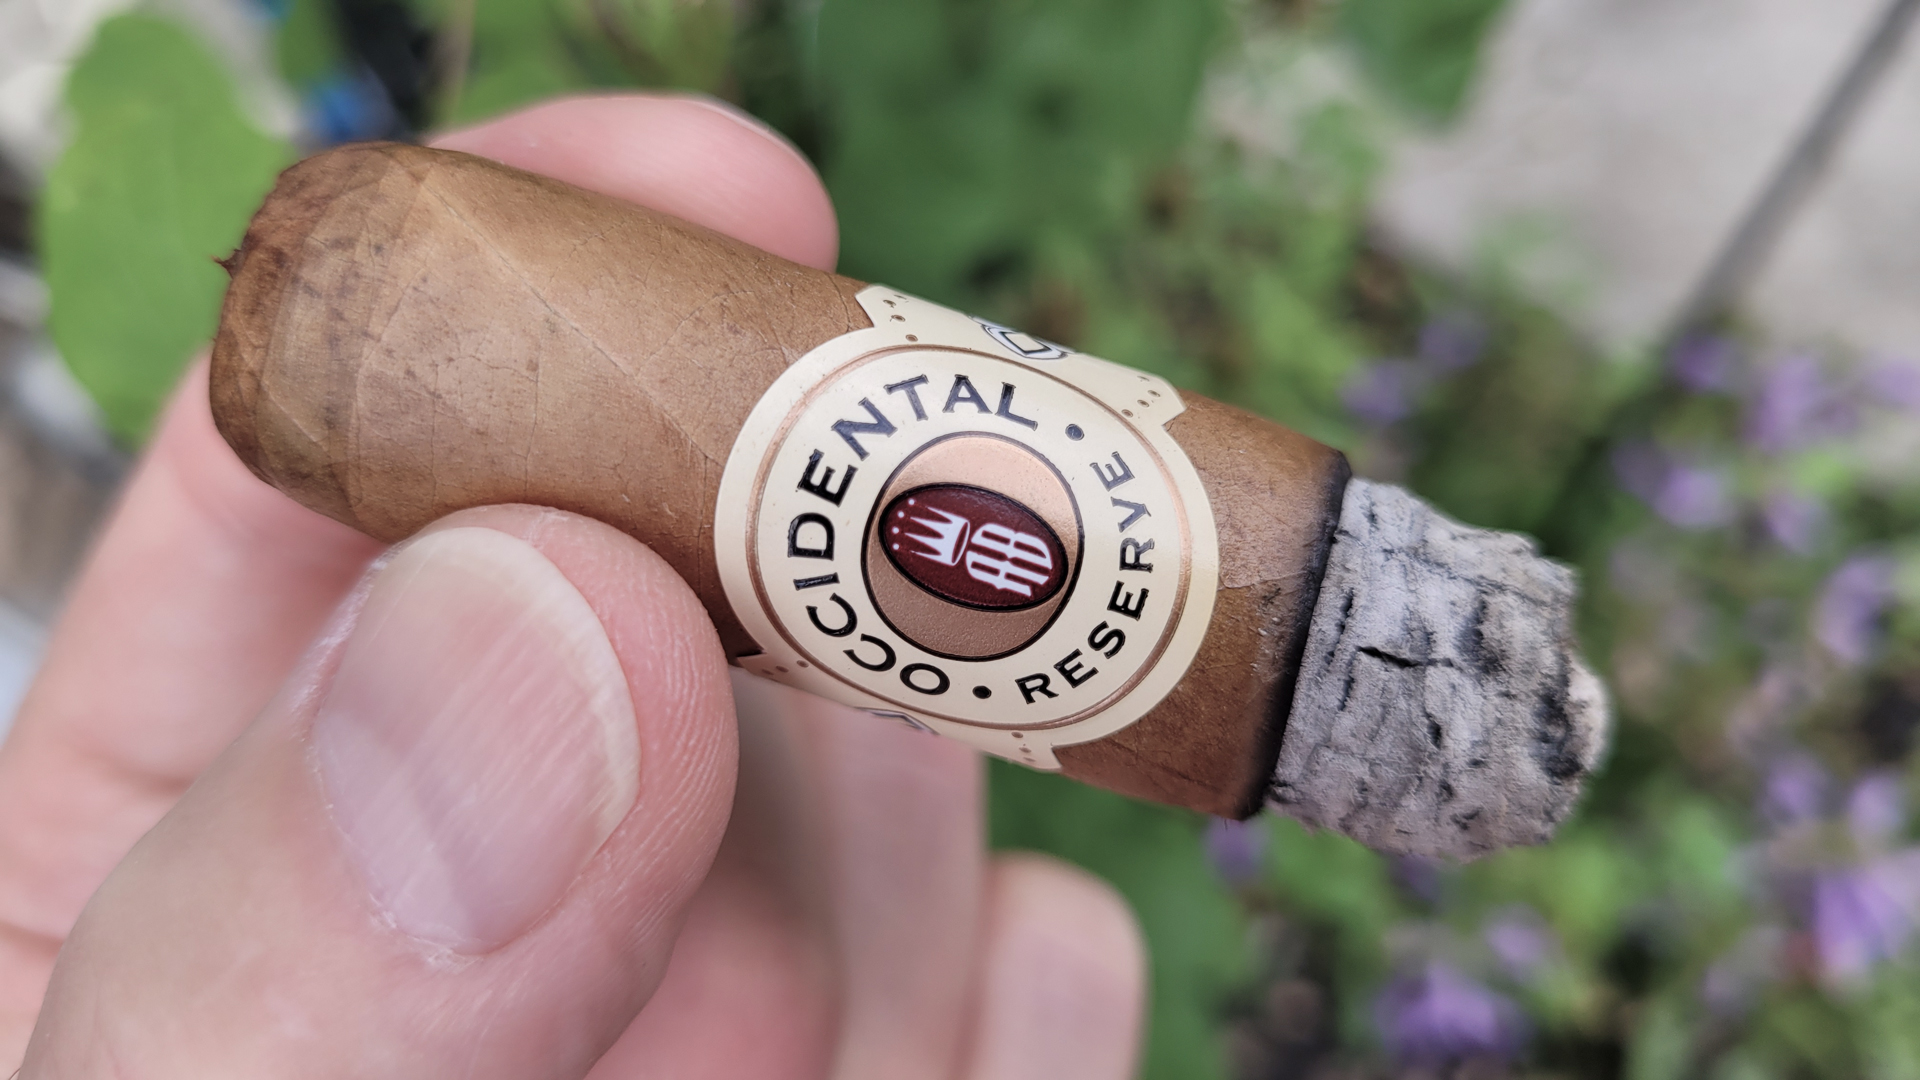 Alec Bradley Occidental Reserve Connecticut Robusto cigar nub